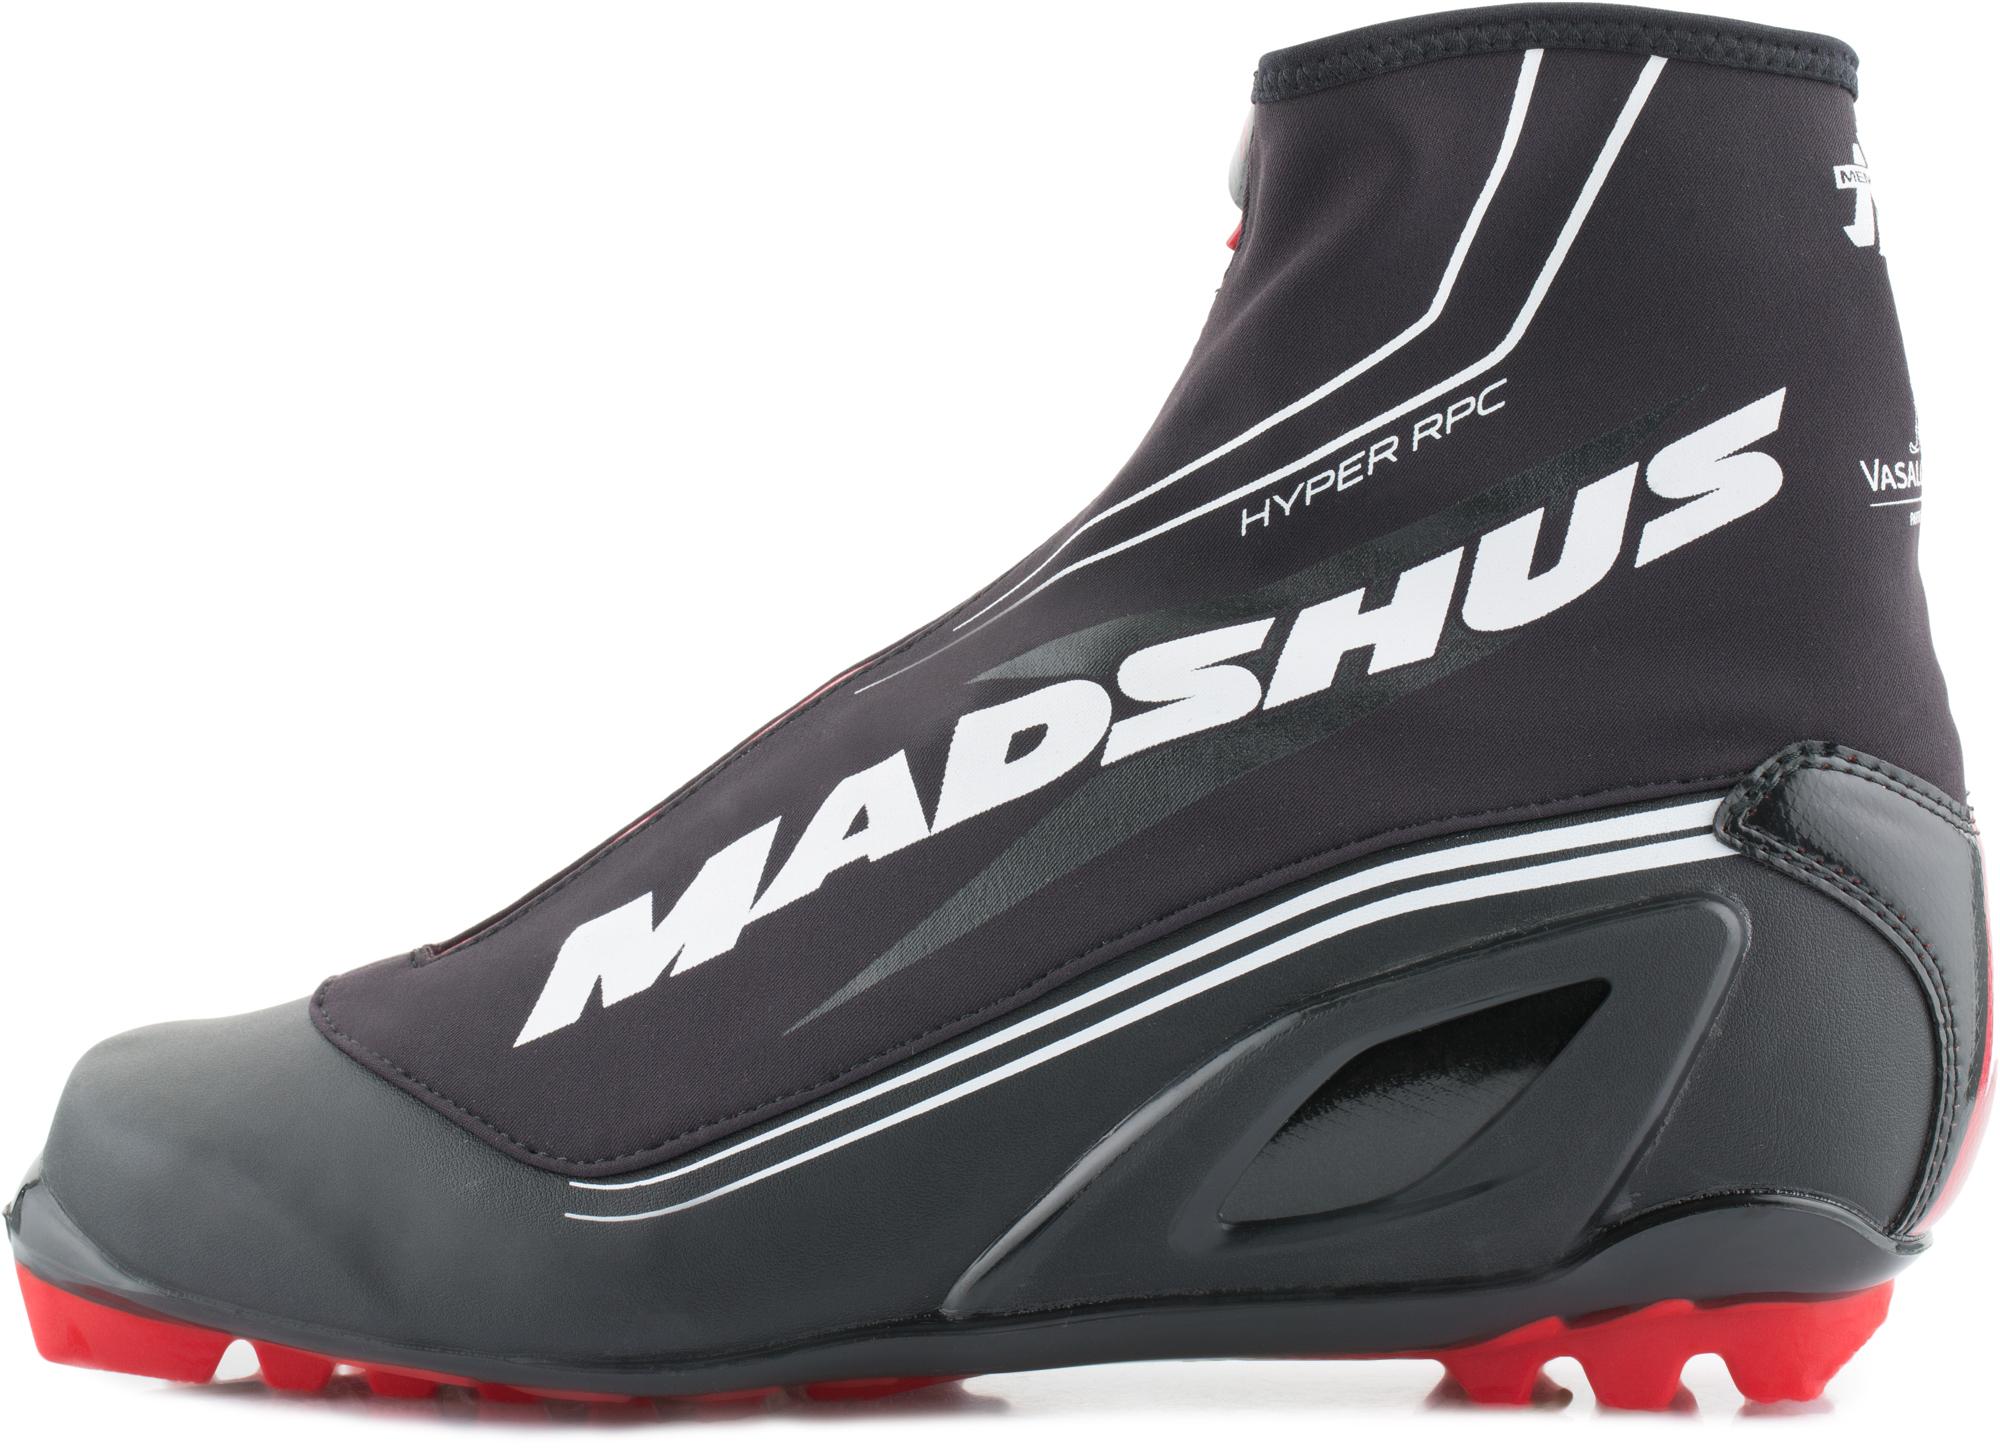 Madshus Ботинки для беговых лыж Madshus Hyper RPC